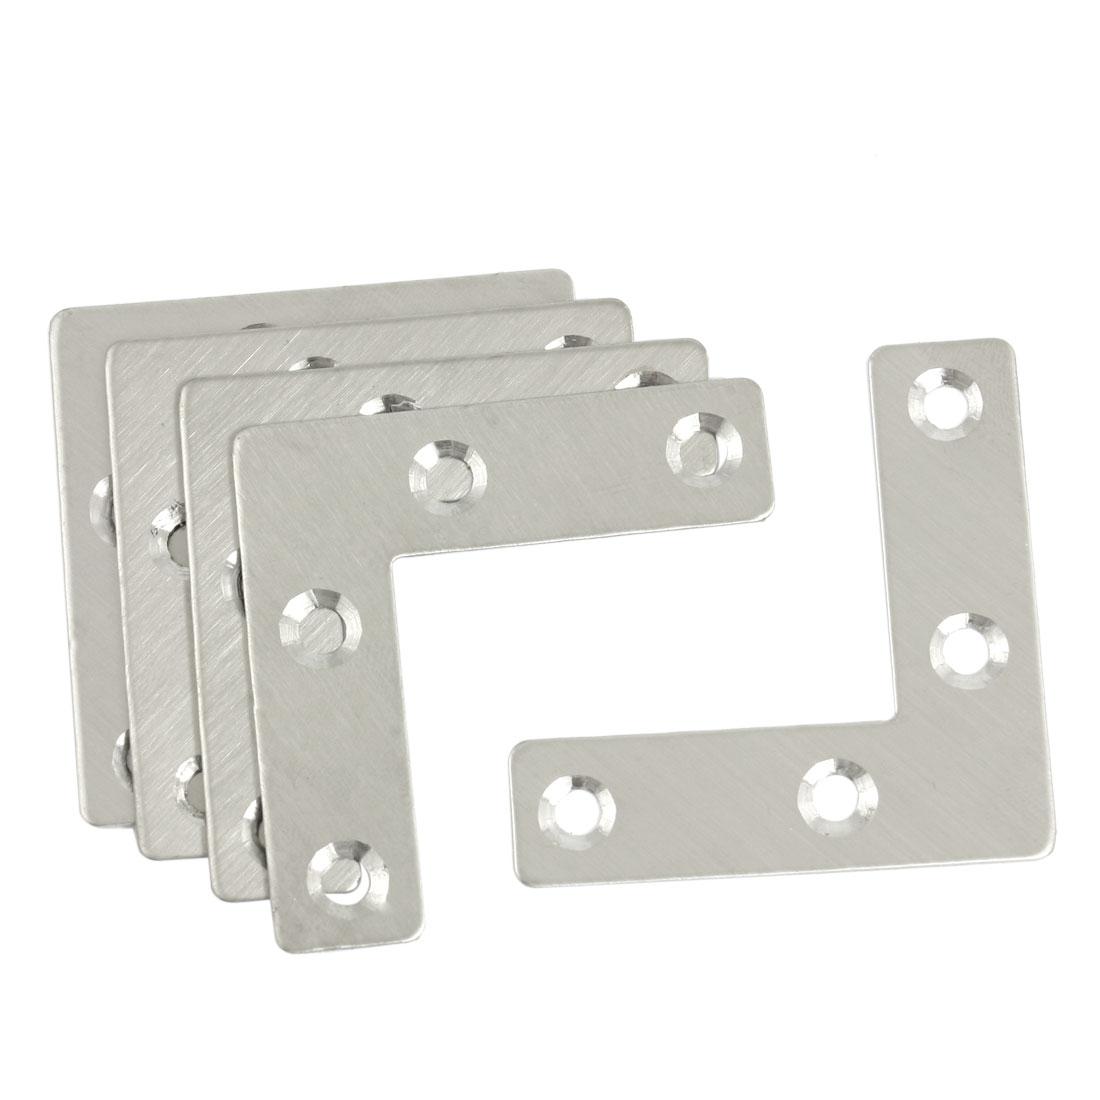 5 Pcs Angle Plate Corner Brace Flat L Shape Repair Bracket 50mm x 50mm